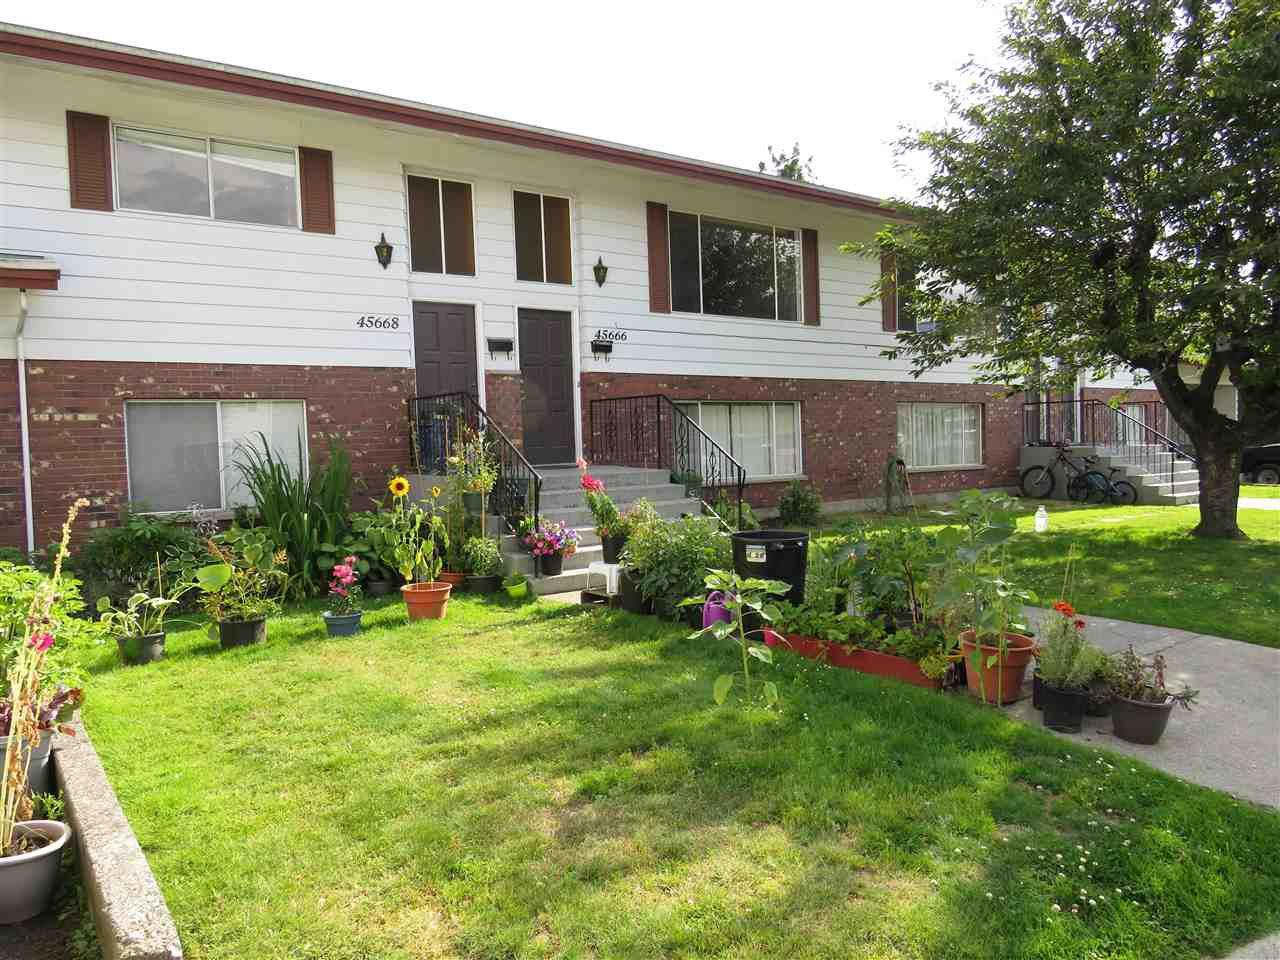 Main Photo: 45664 FERNWAY Avenue in Chilliwack: Chilliwack N Yale-Well House Fourplex for sale : MLS®# R2389332